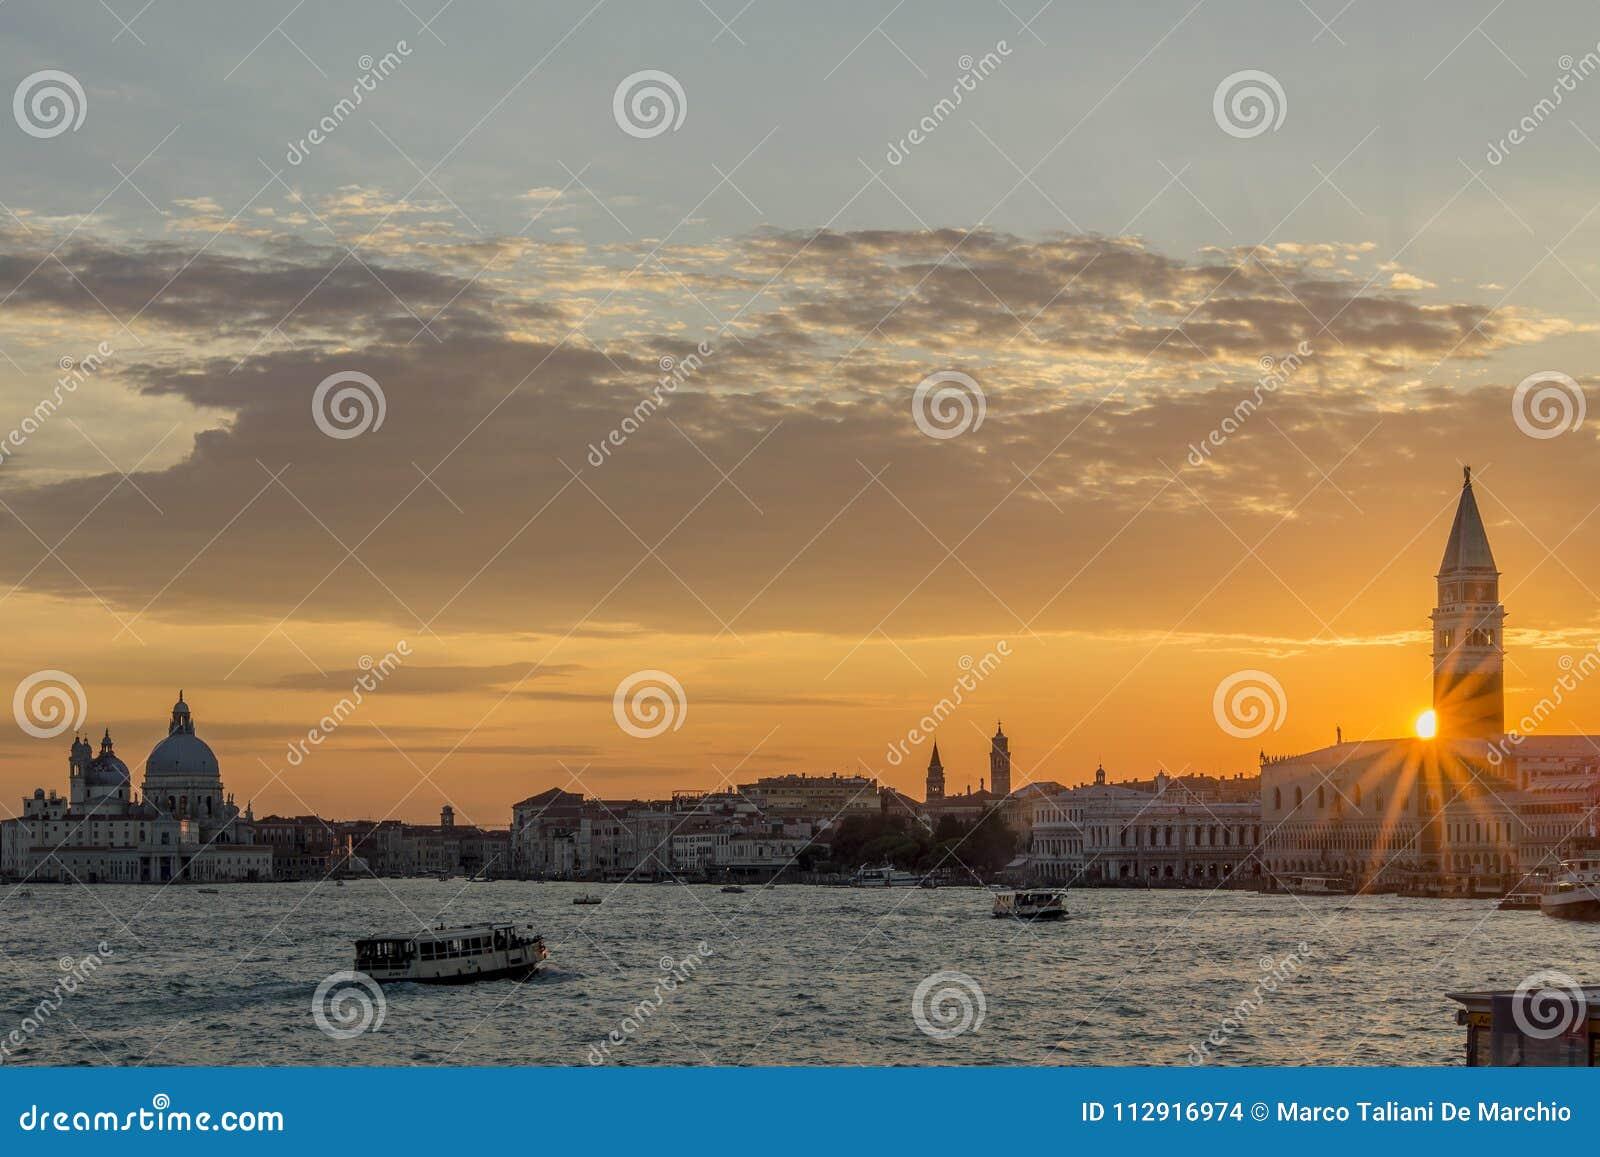 Puesta del sol gloriosa en la laguna veneciana, Venecia, Italia